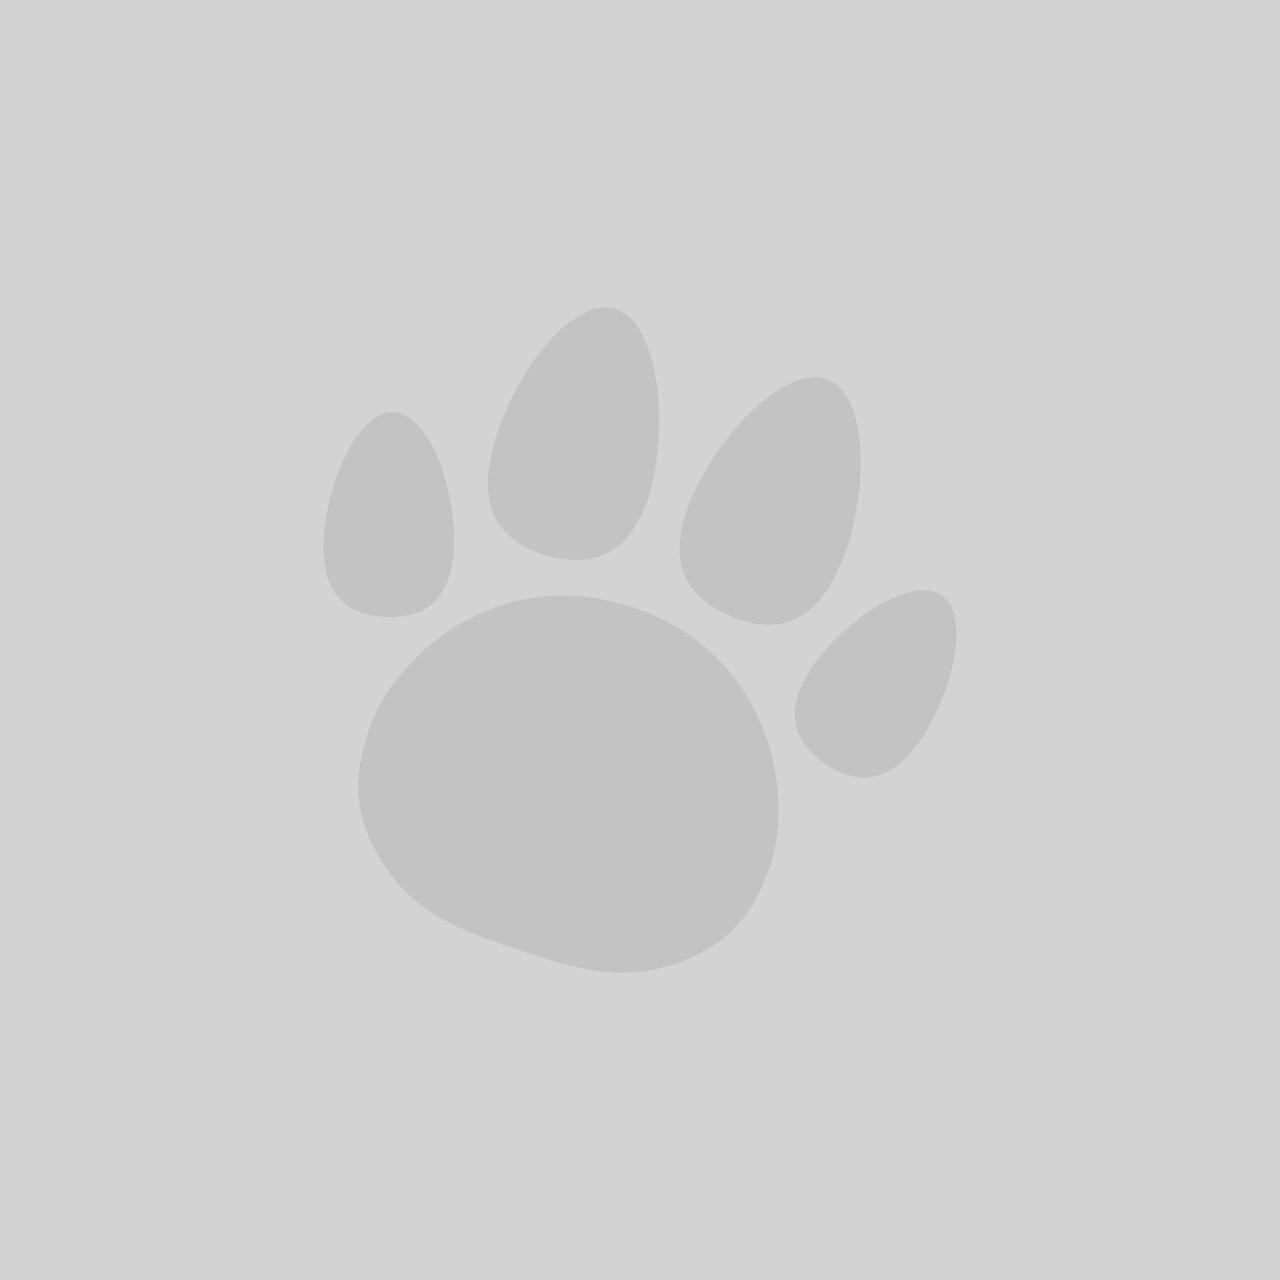 Ancol Nylon Softweave Dog Lead 1mx10mm (3 Colour Options)